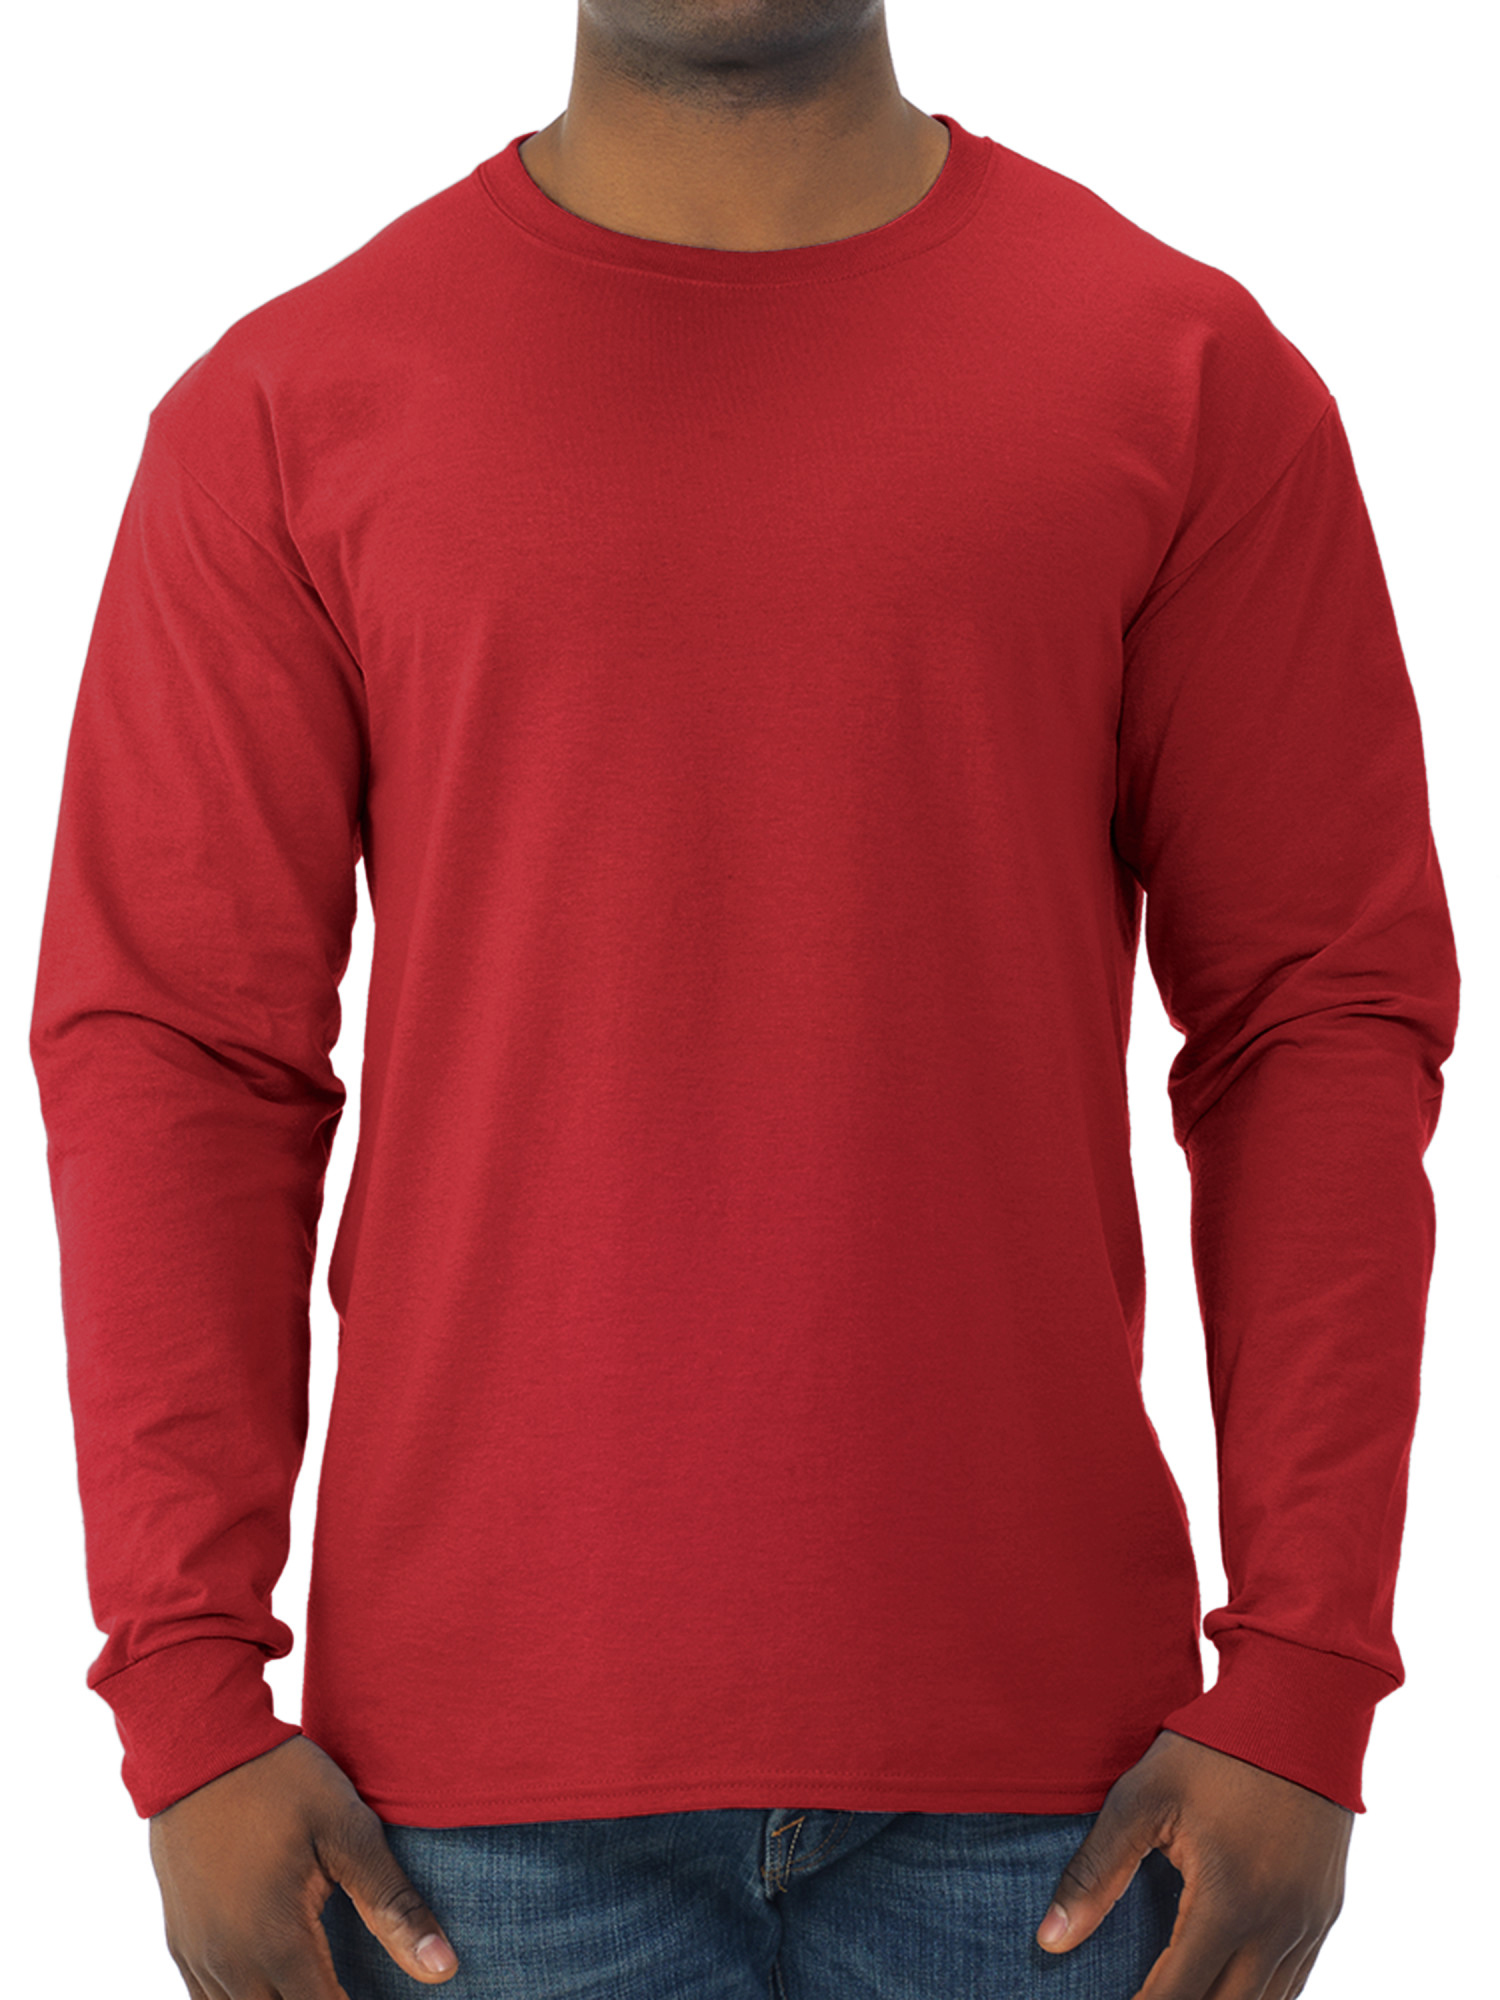 Big Men's Dri-Power Long Sleeve Crewneck T Shirt